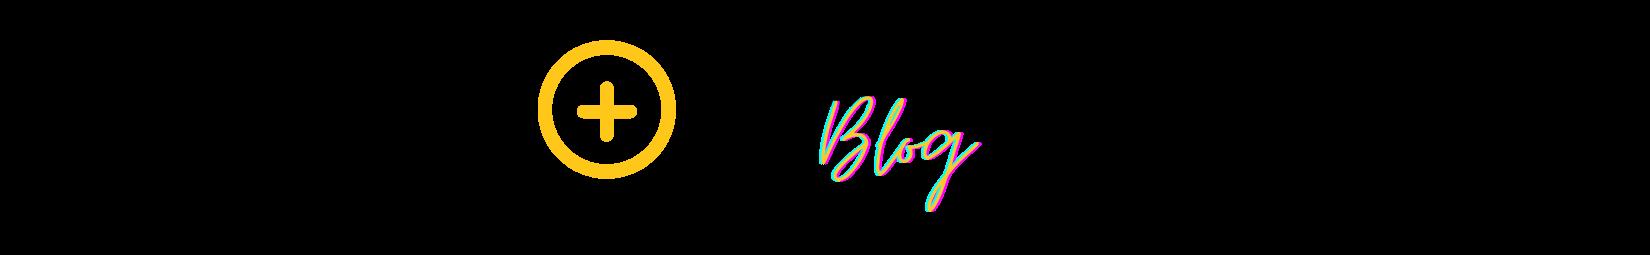 Ad Bands Blog